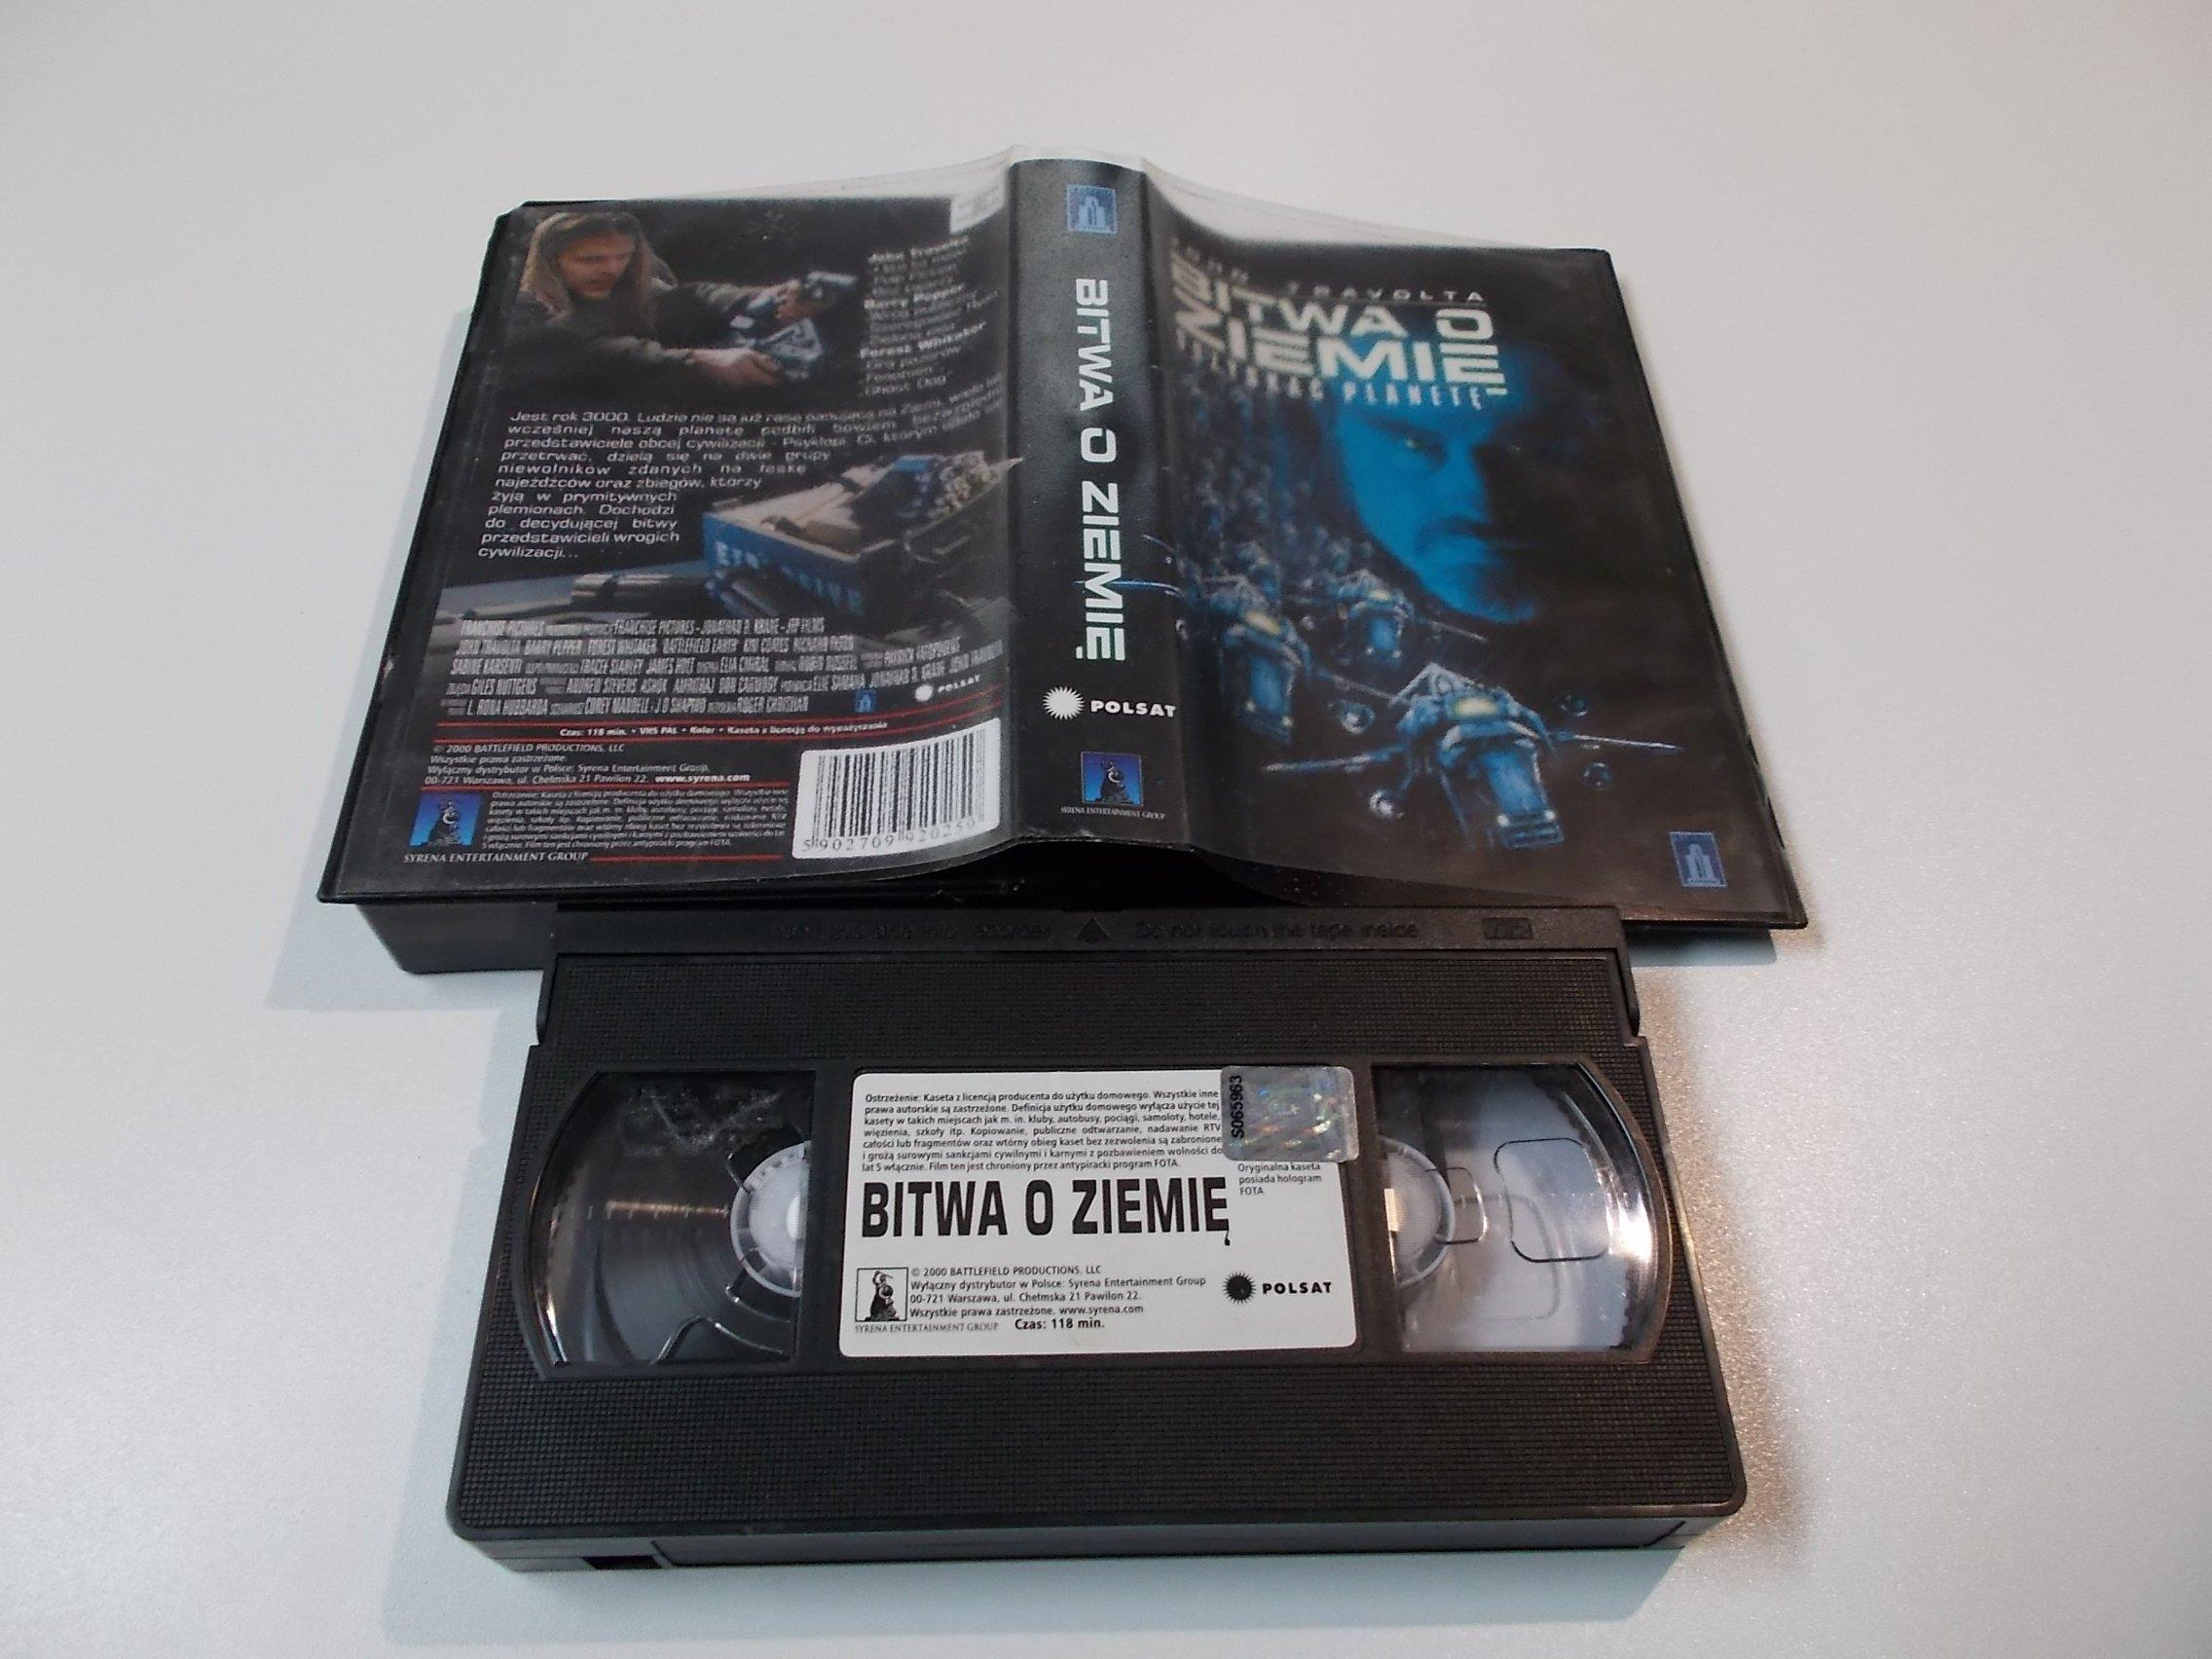 BITWA O ZIEMIĘ - kaseta Video VHS - 1460 Sklep